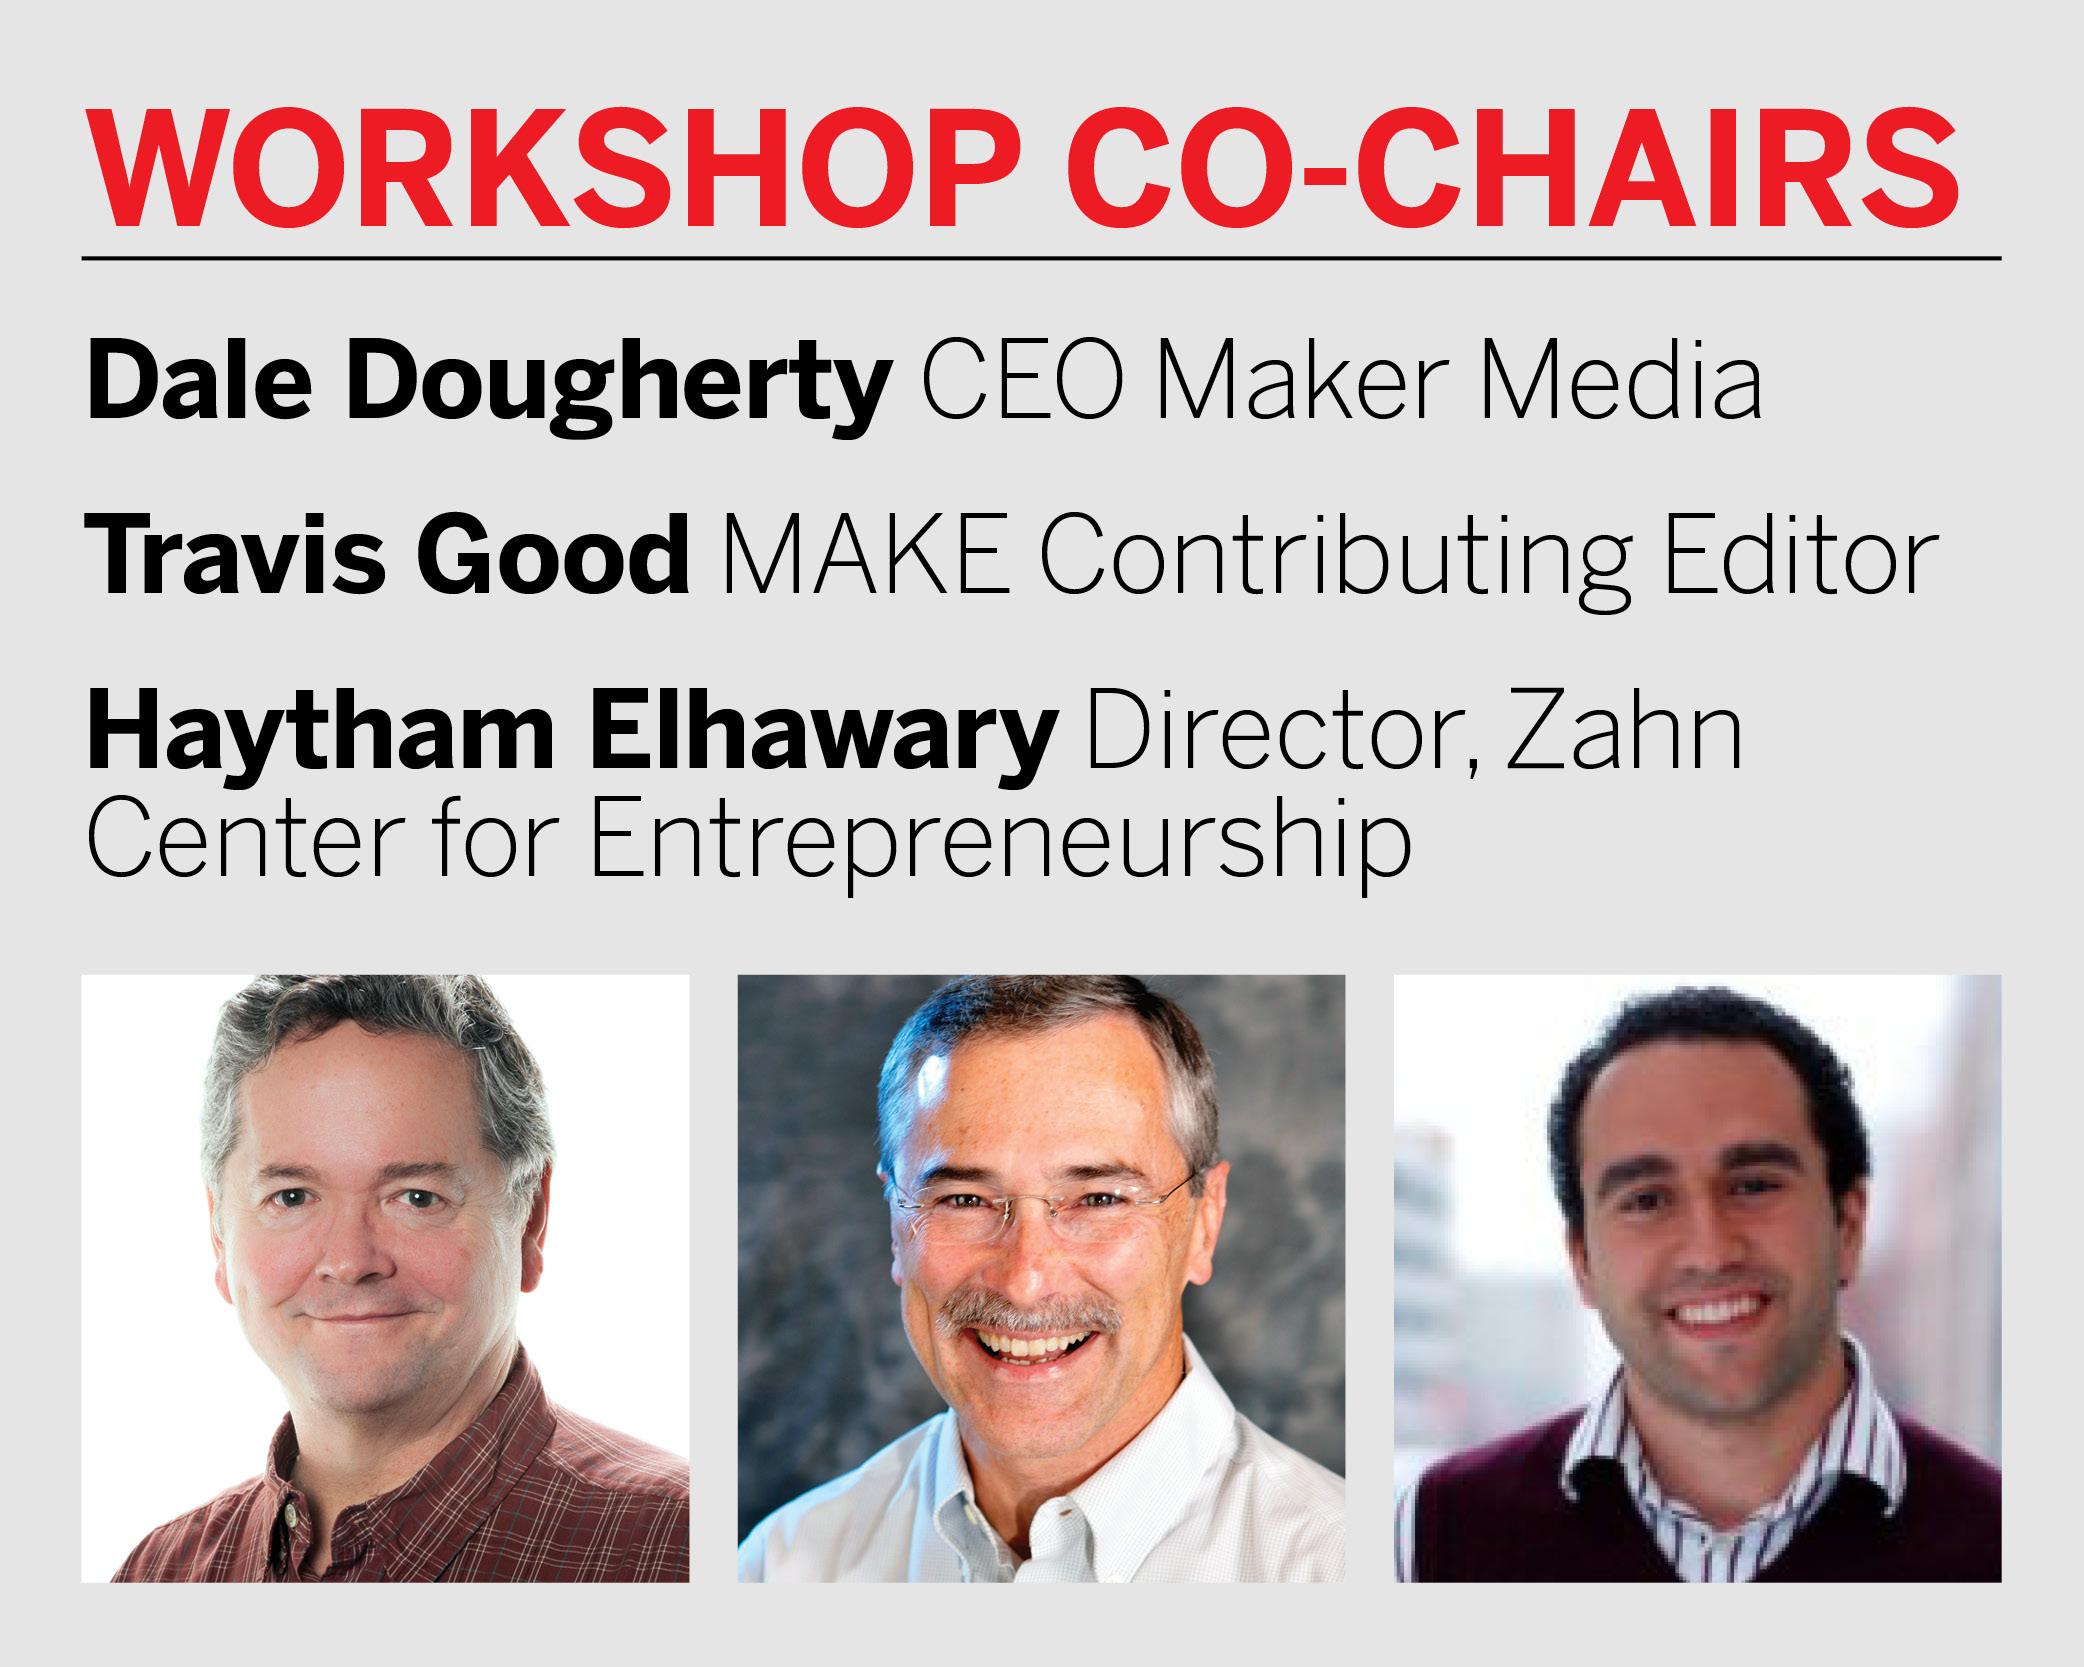 Hardware Innovation Workshop Comes to New York